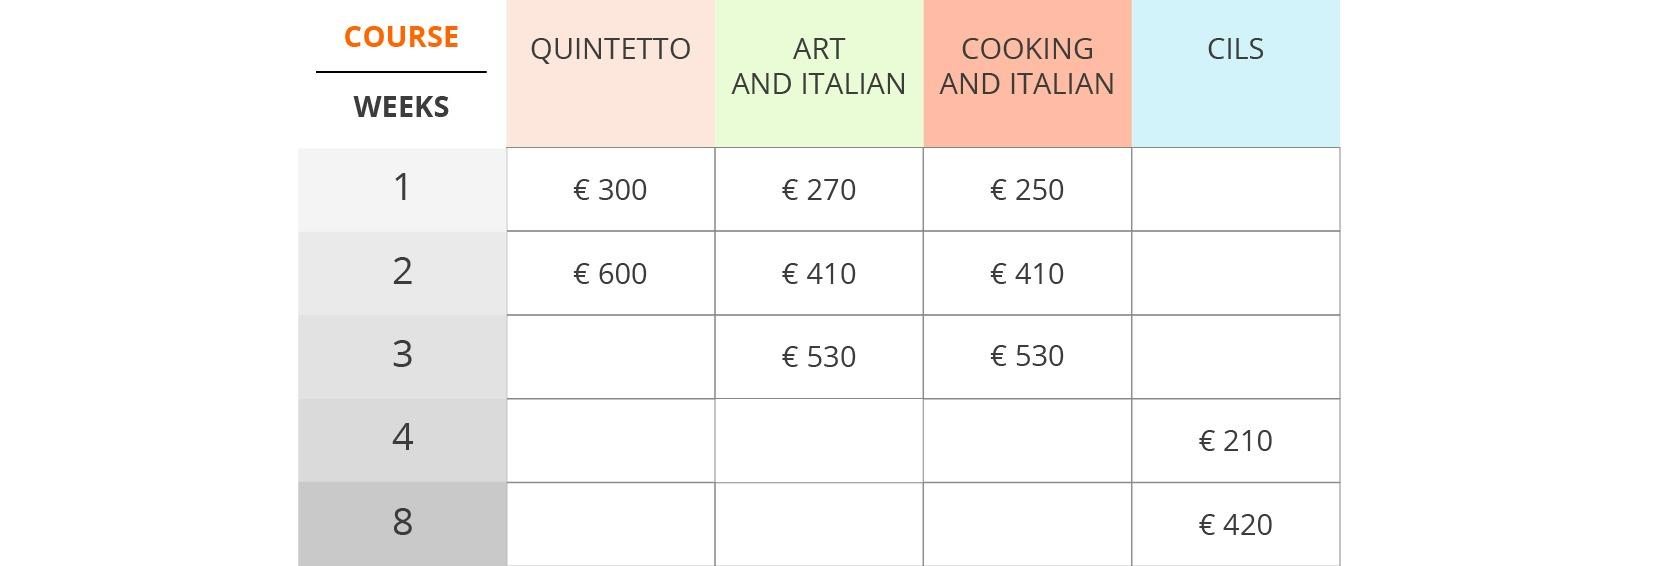 tabella prezzi parola3 03 1 - ITALYANCA KURSLARİ